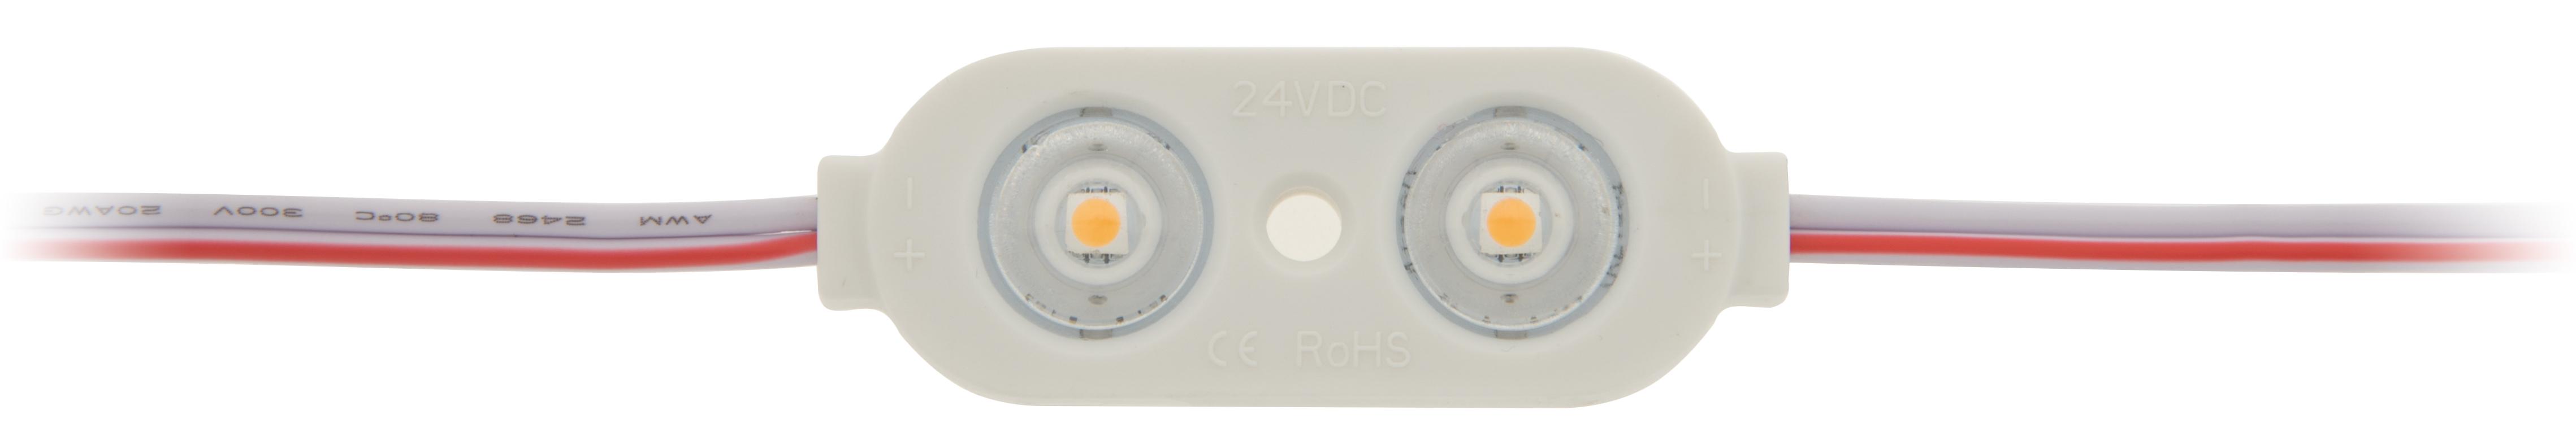 1 Stk LED Modulkette Twin 12 HW (Halogen Weiss)  IP65  CRI/RA 90+ LIMK002010